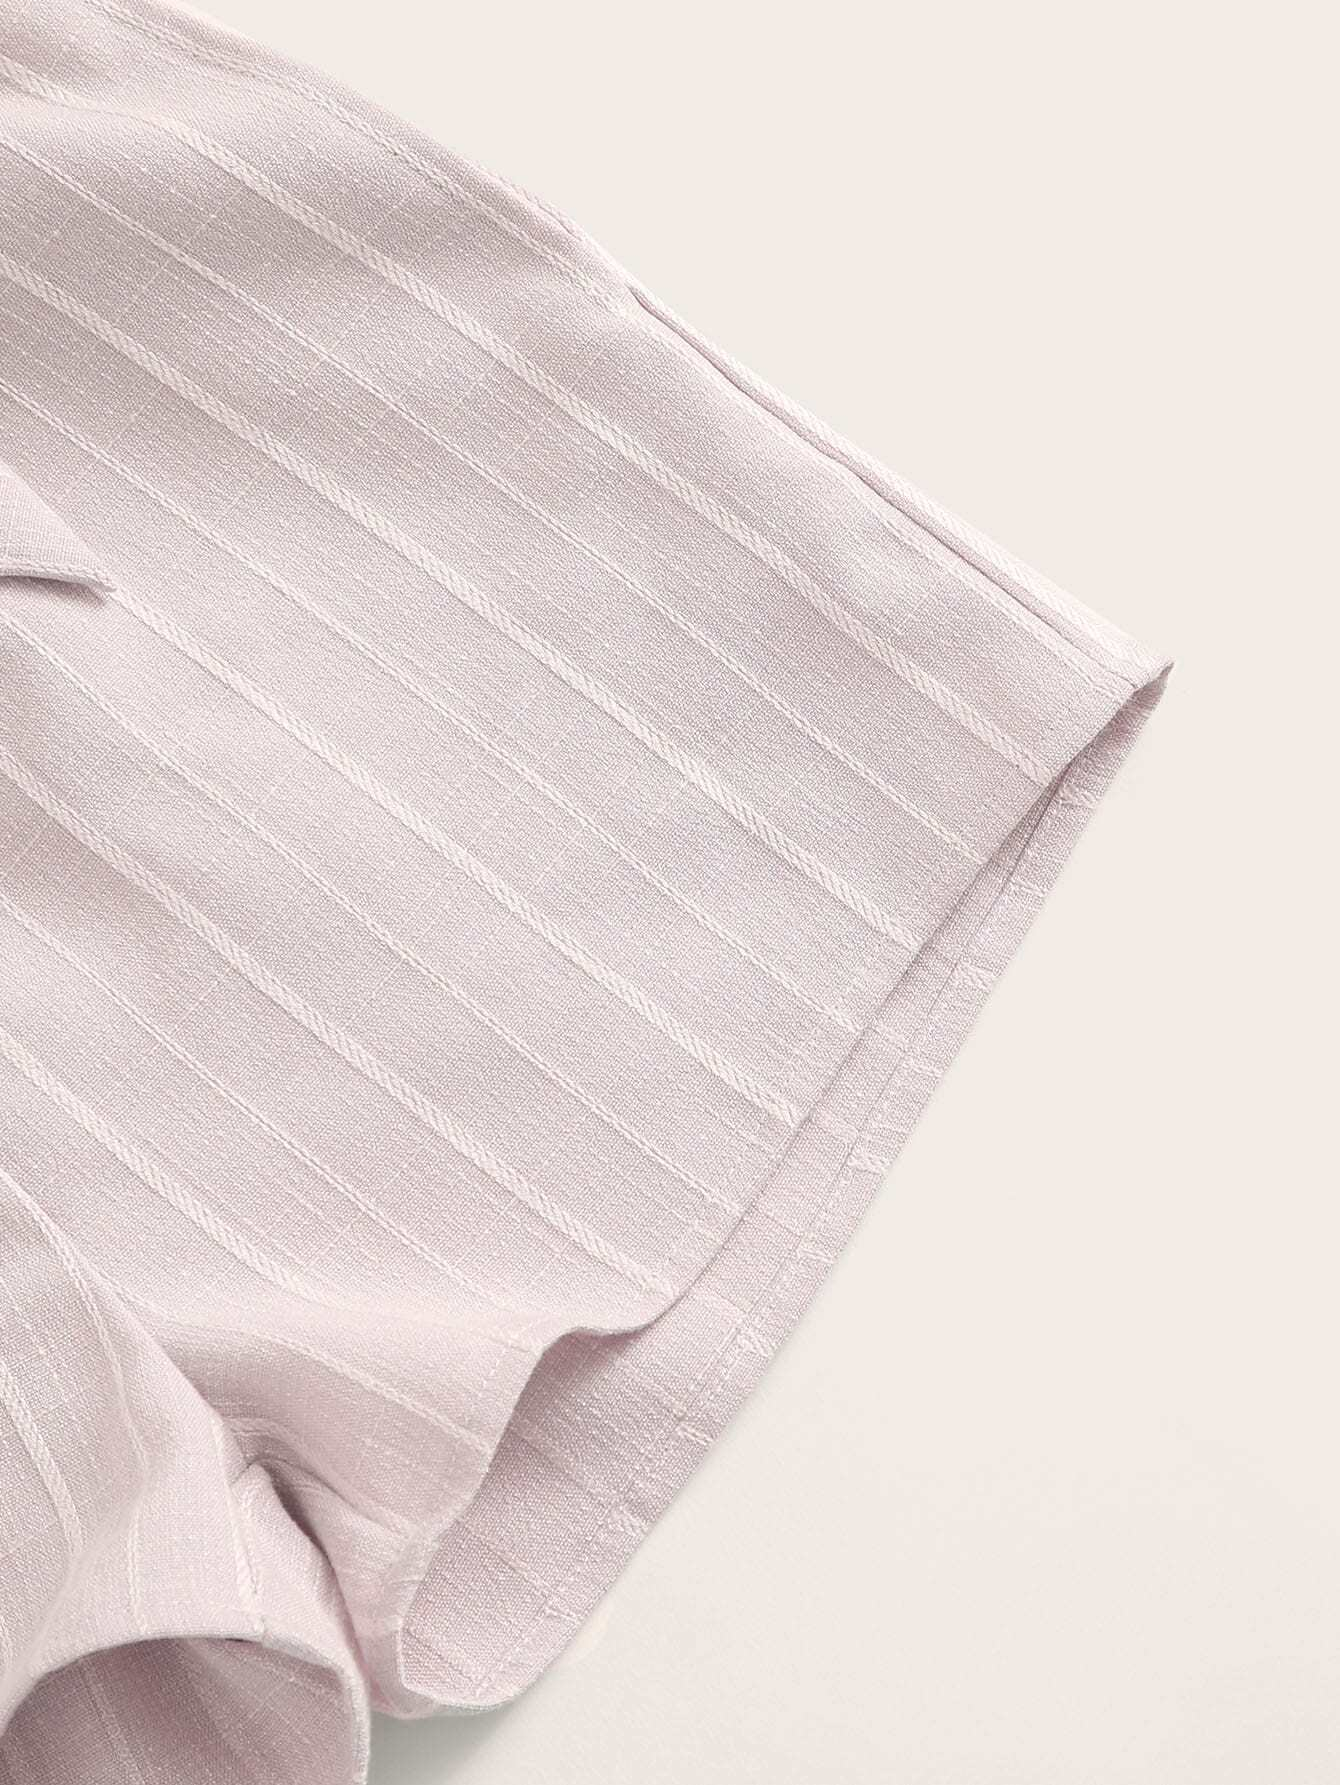 SHEIN / Conjunto de niñas bandeau sólido con shorts de rayas de cintura con volante